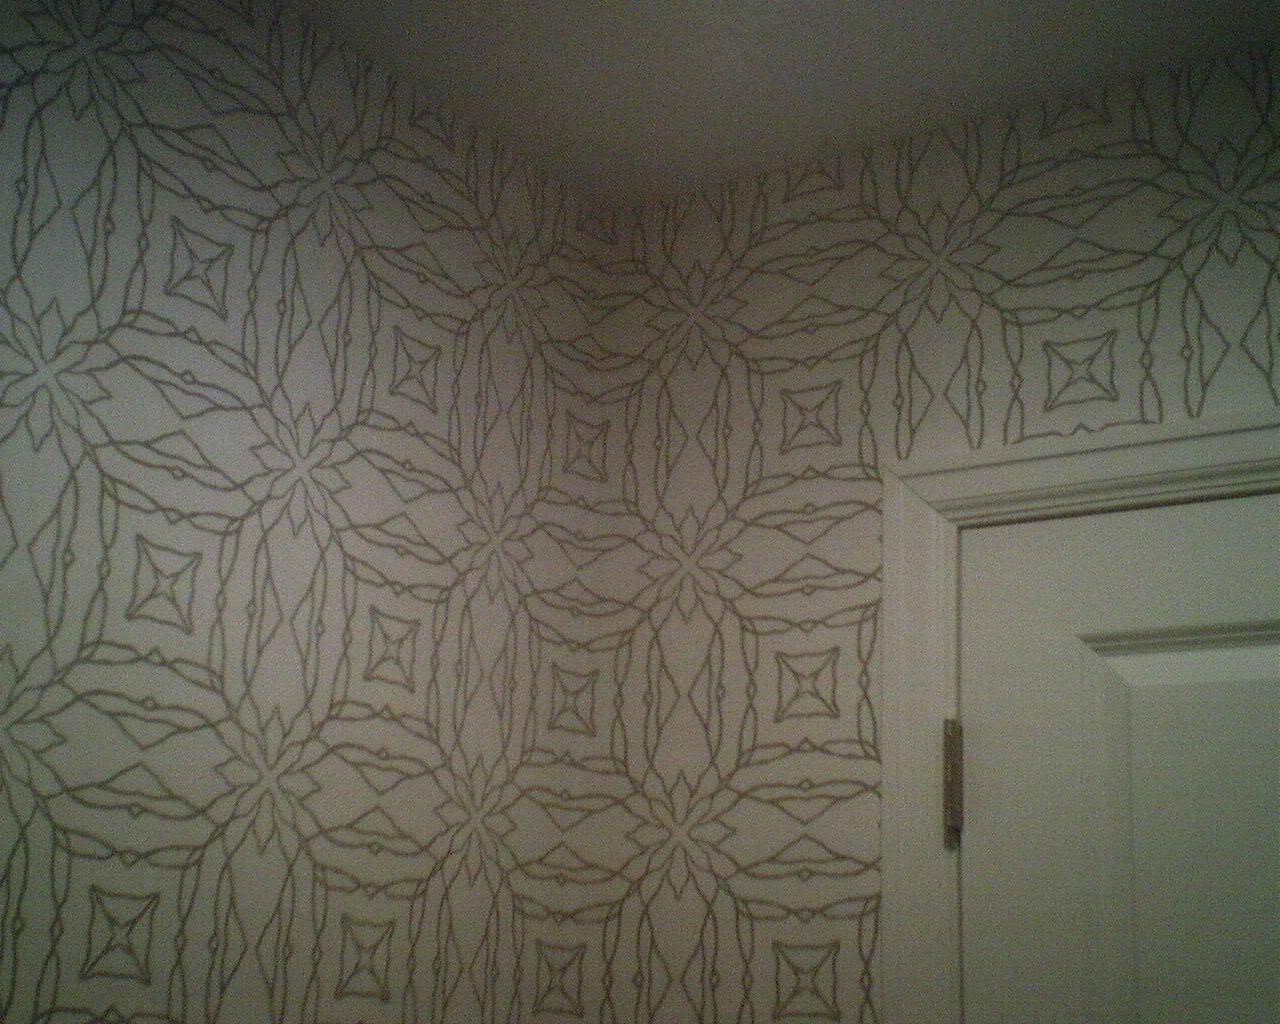 Good Wallpaper Home Screen Pineapple - dsc00023  Snapshot_128716.jpg